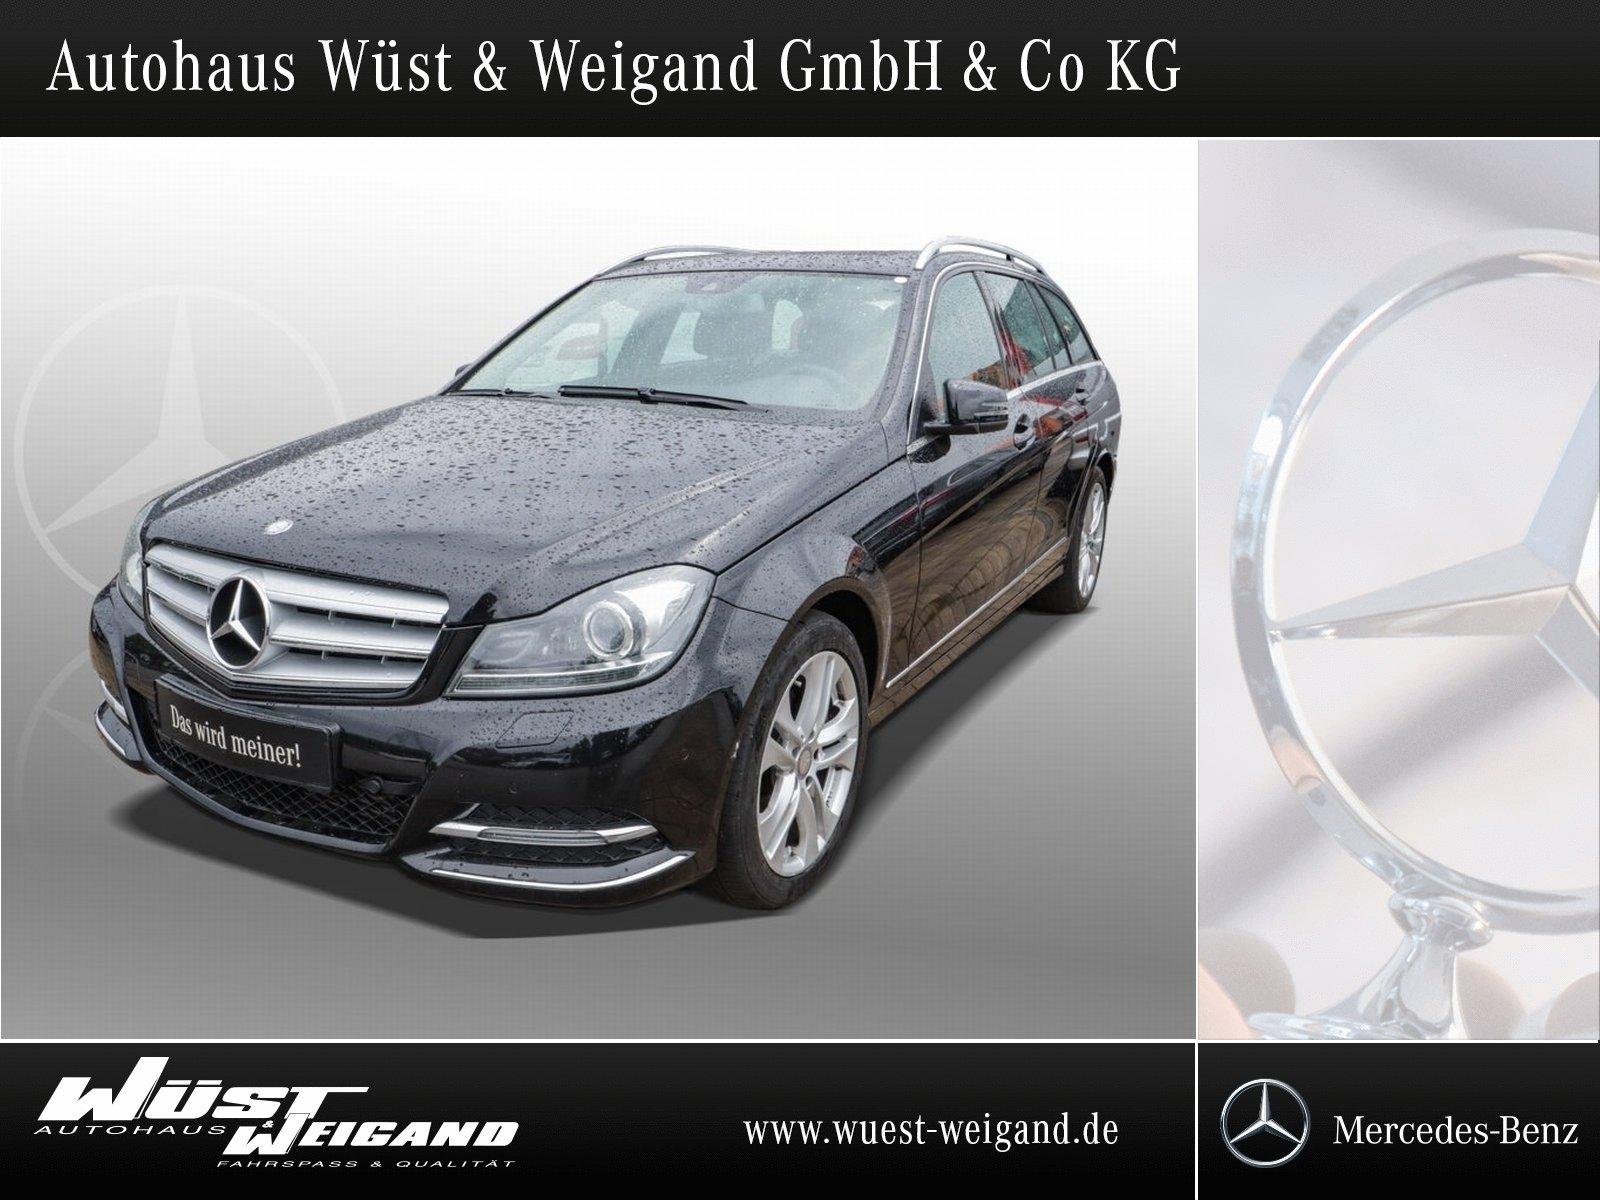 Mercedes-Benz C 250 CDI Avantgarde+Autom.+Comand+AHK+LED+SHD, Jahr 2013, Diesel